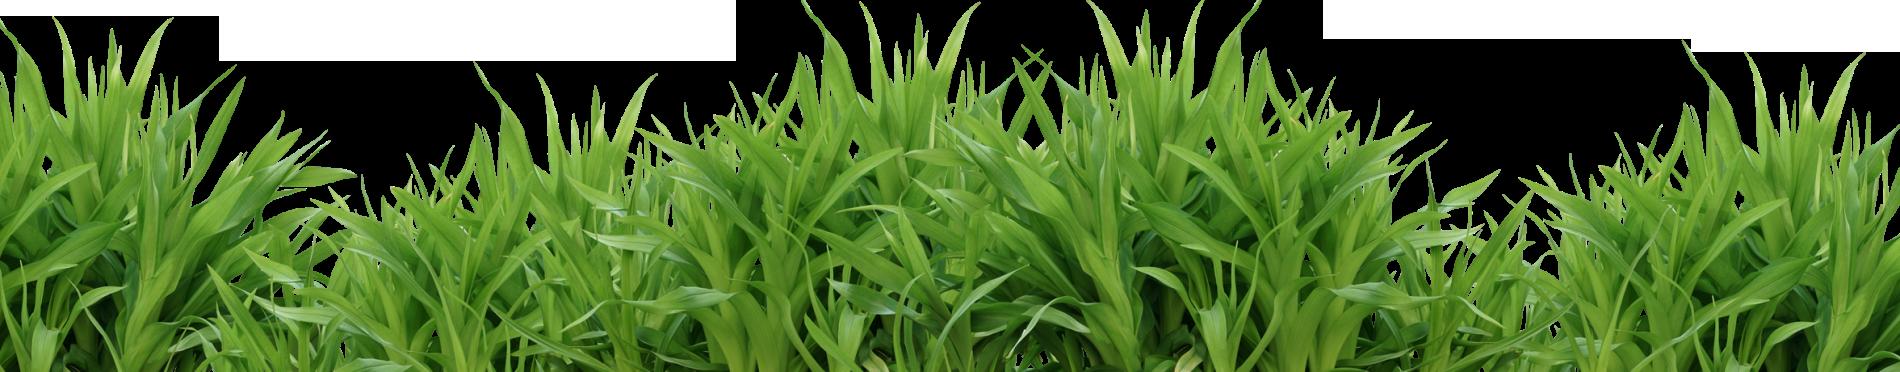 Grass png images pictures. Farm clipart pasture